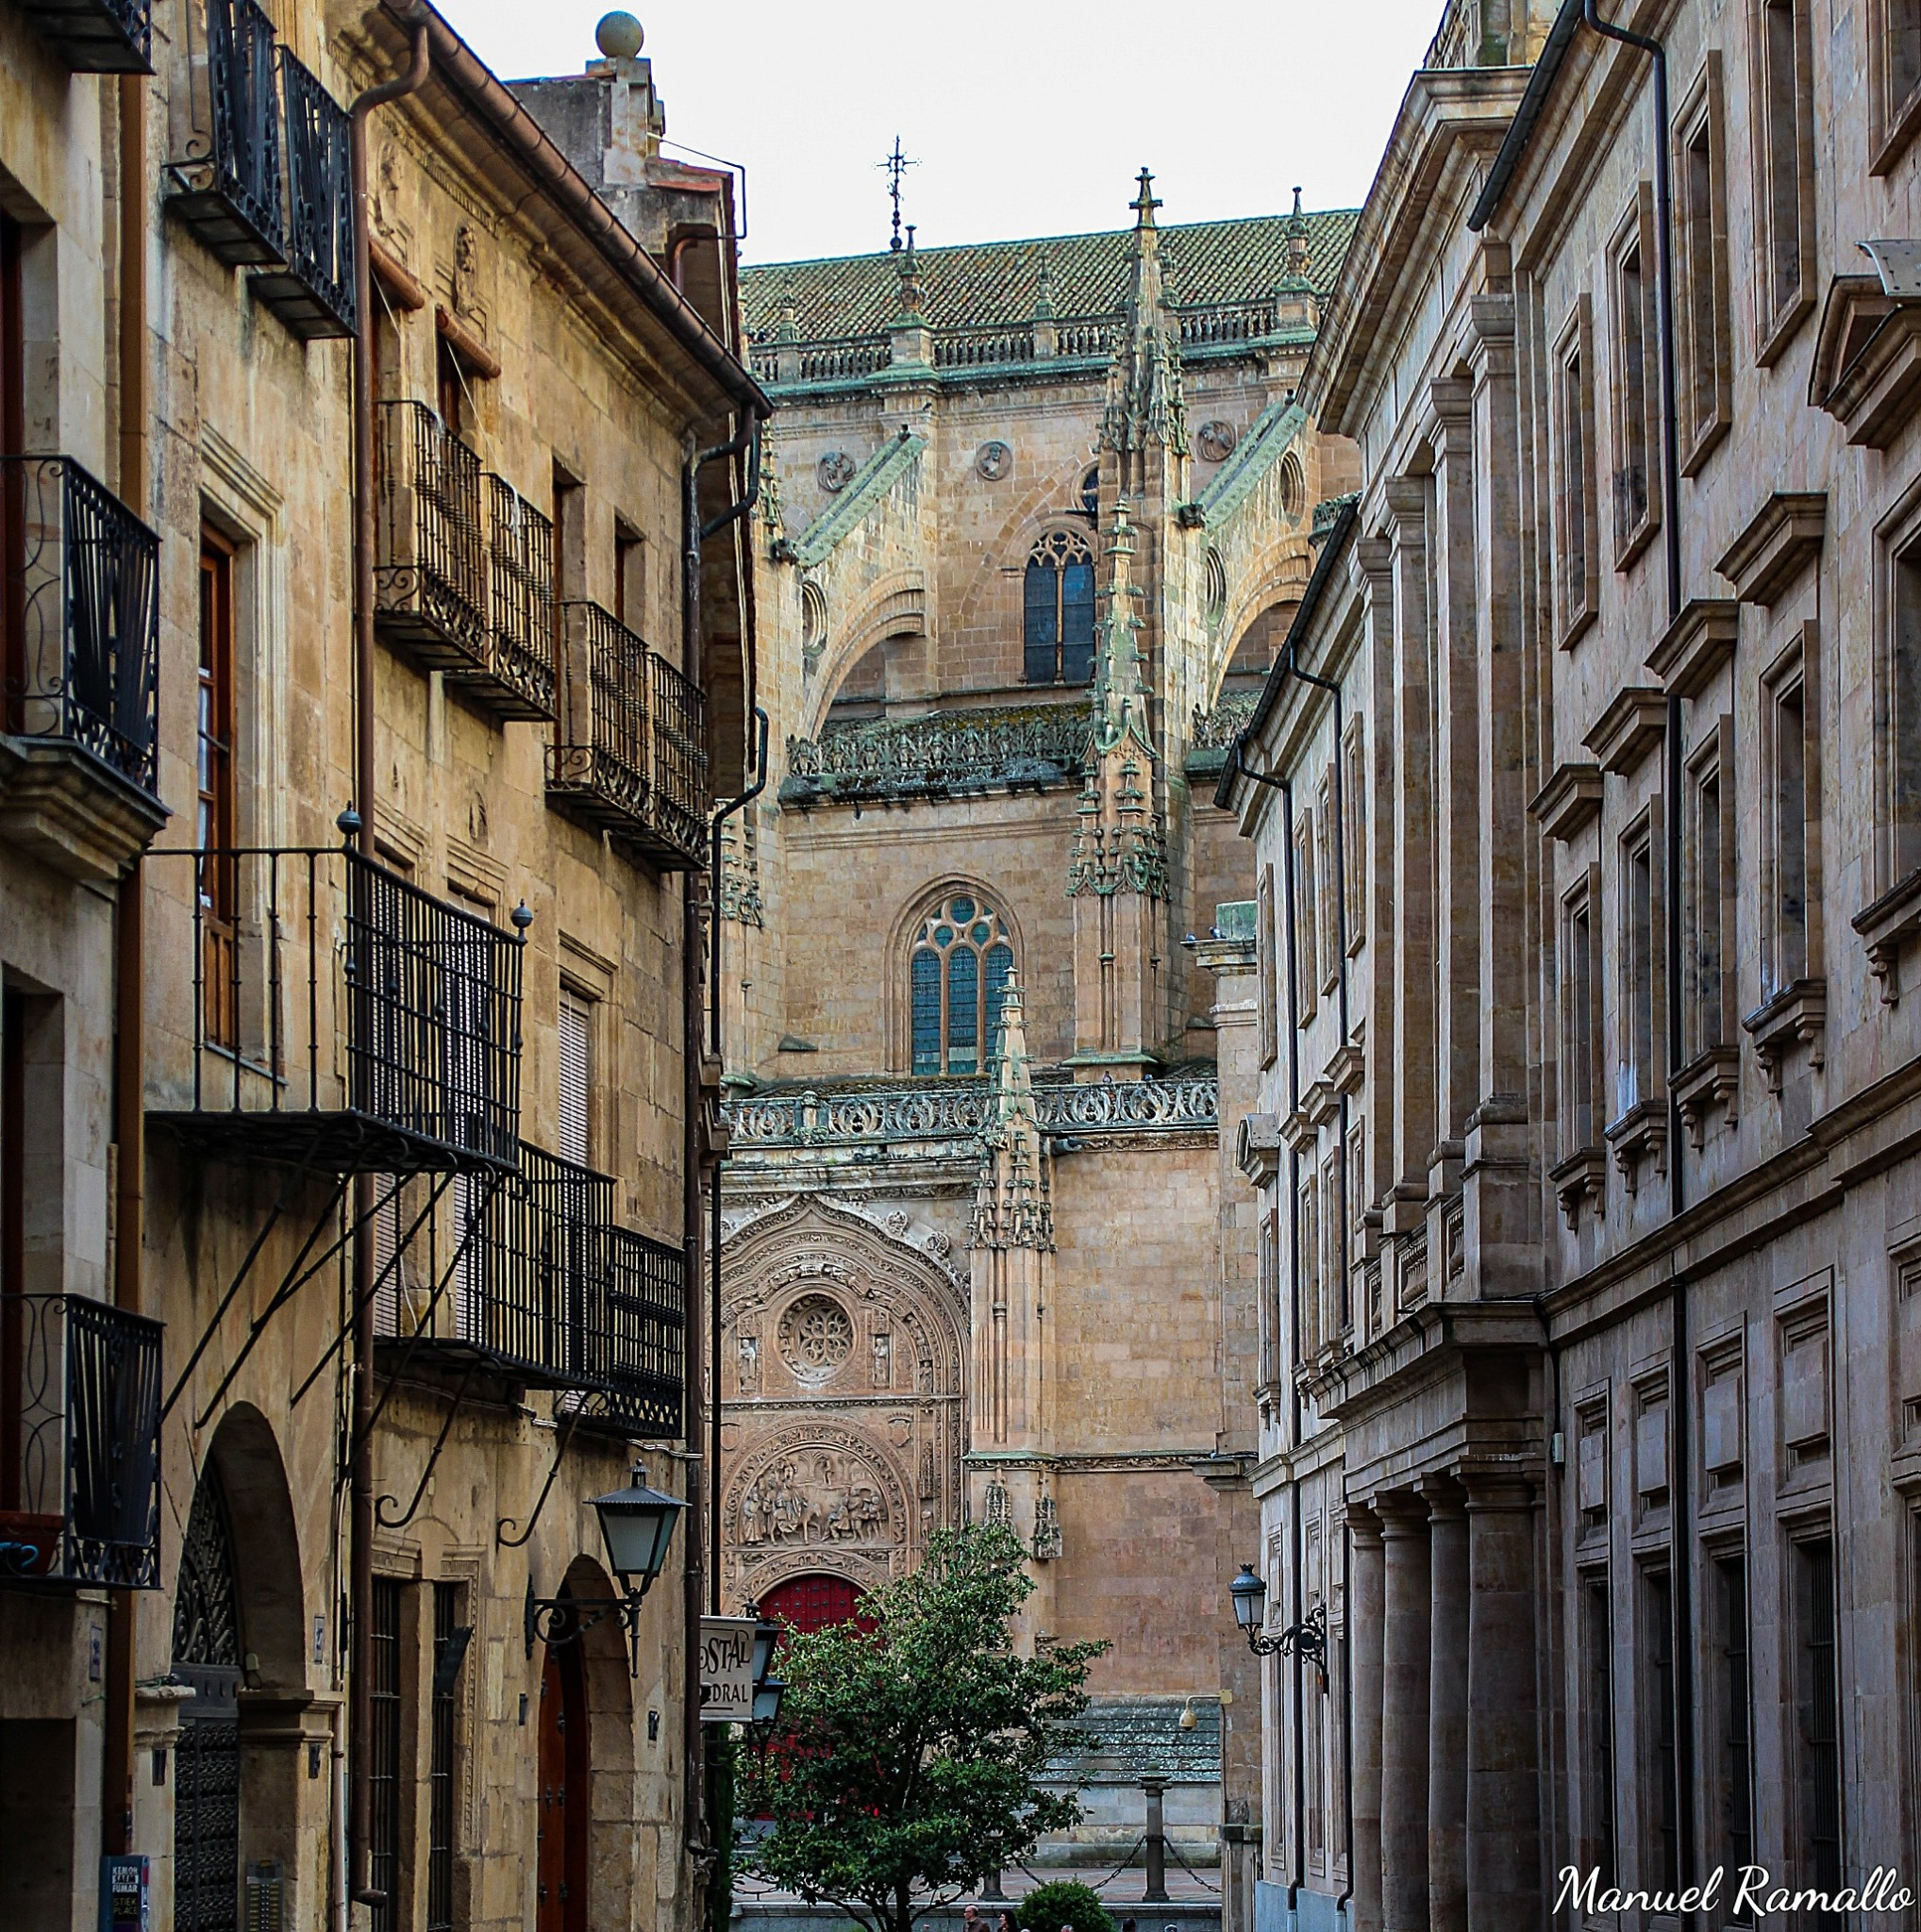 al-fondo-de-la-calle-se-ve-la-catedral-de-salamanca